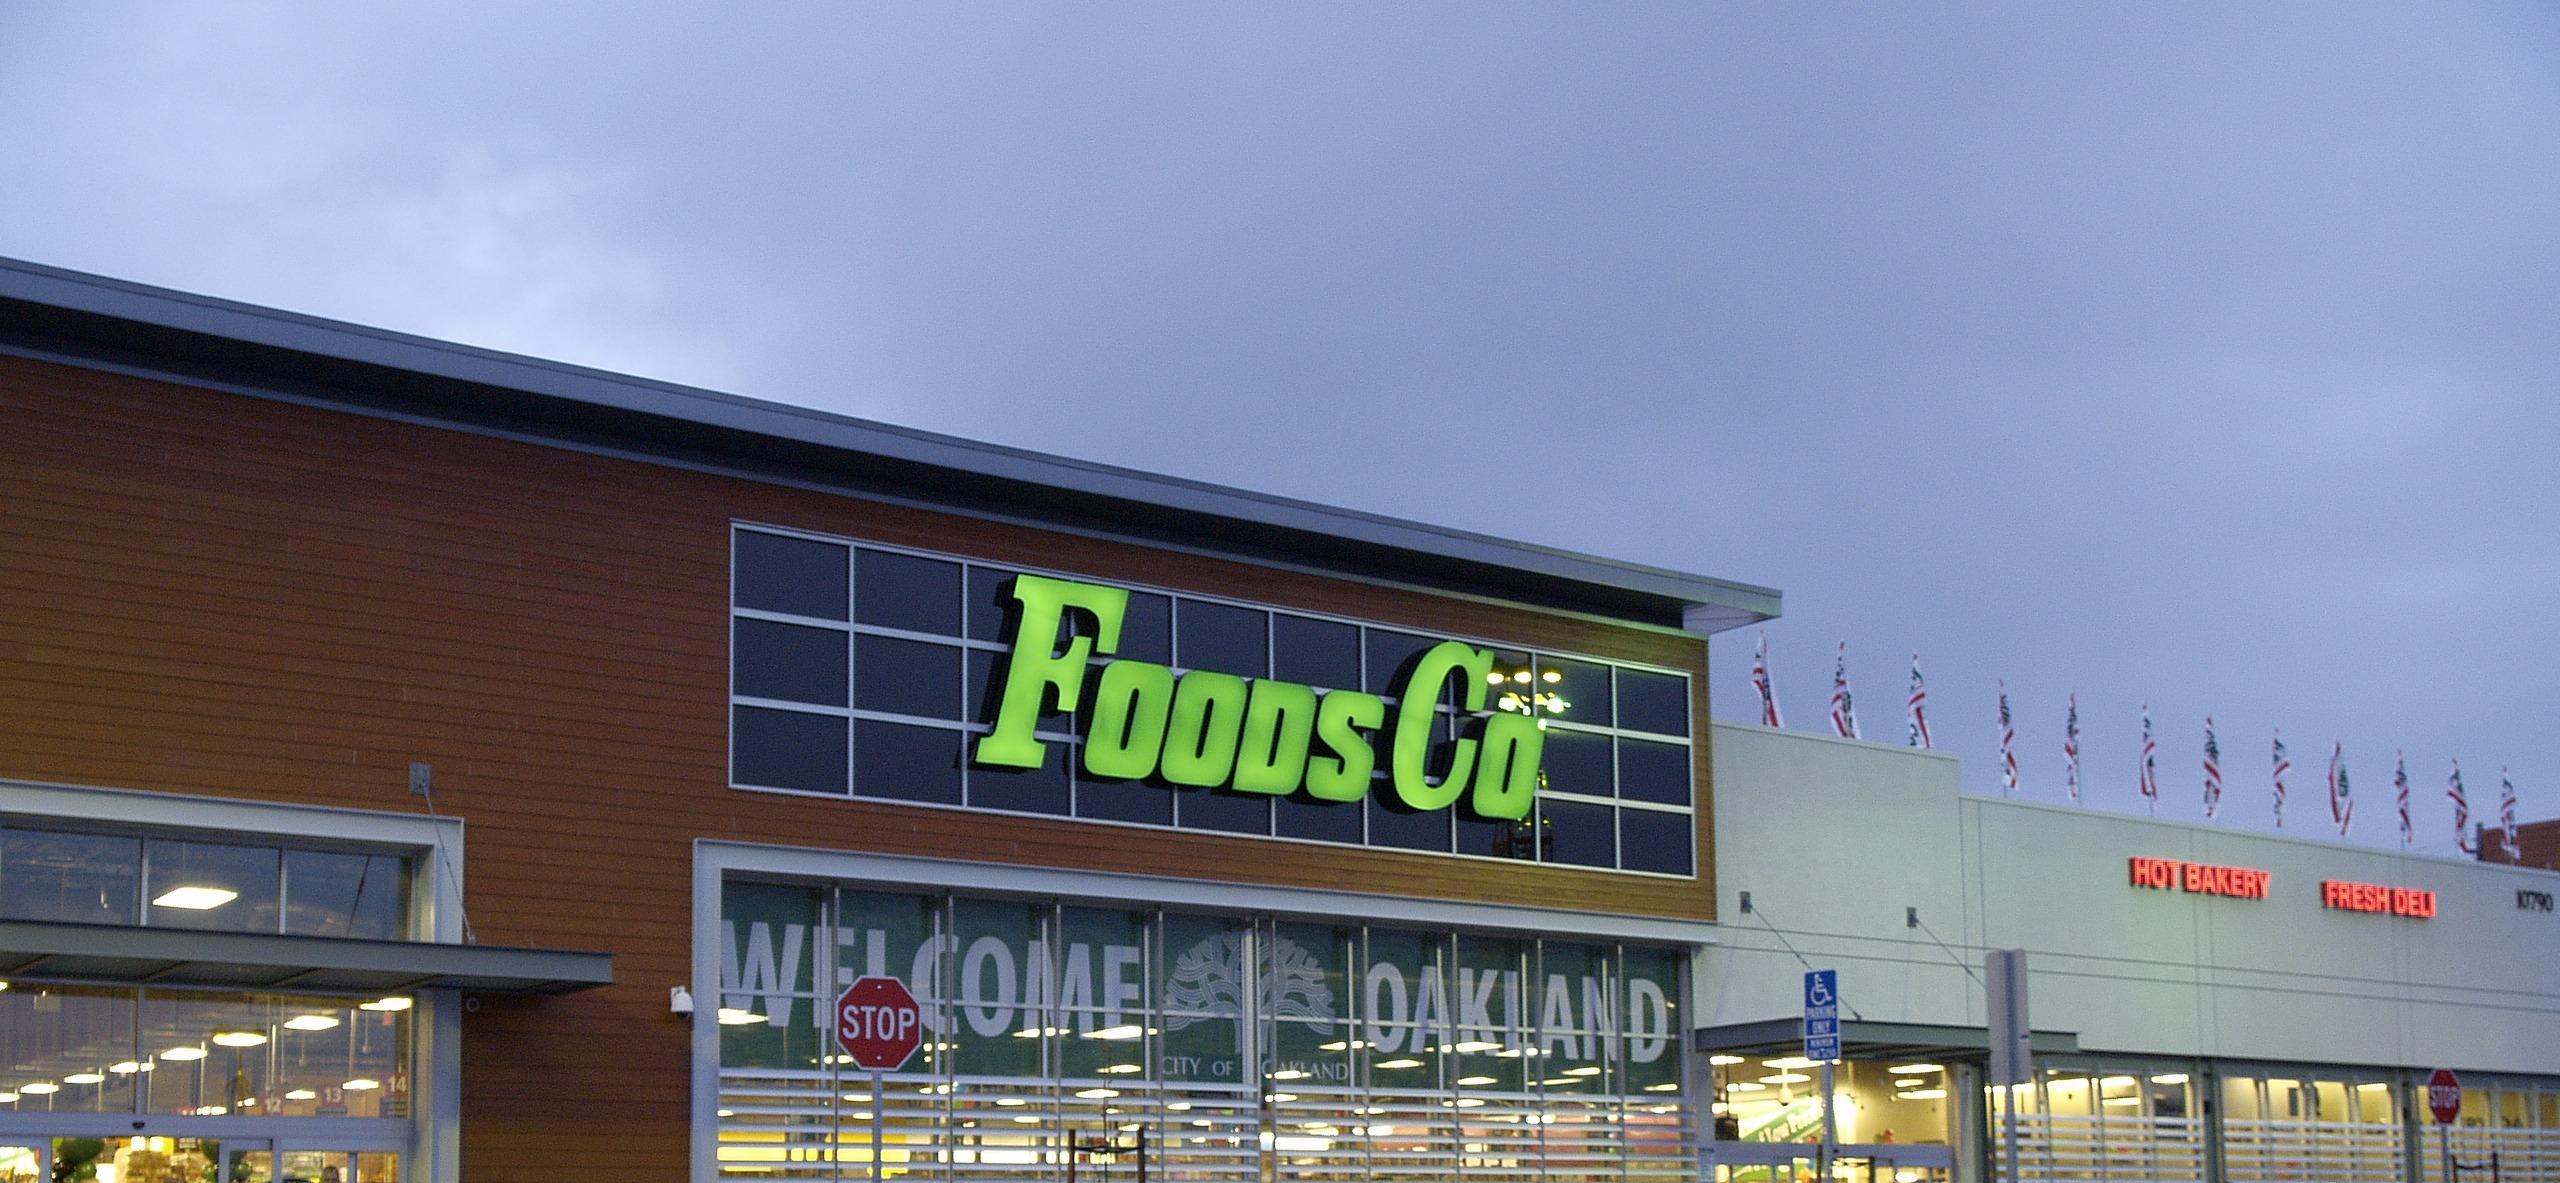 Foodsco image 0